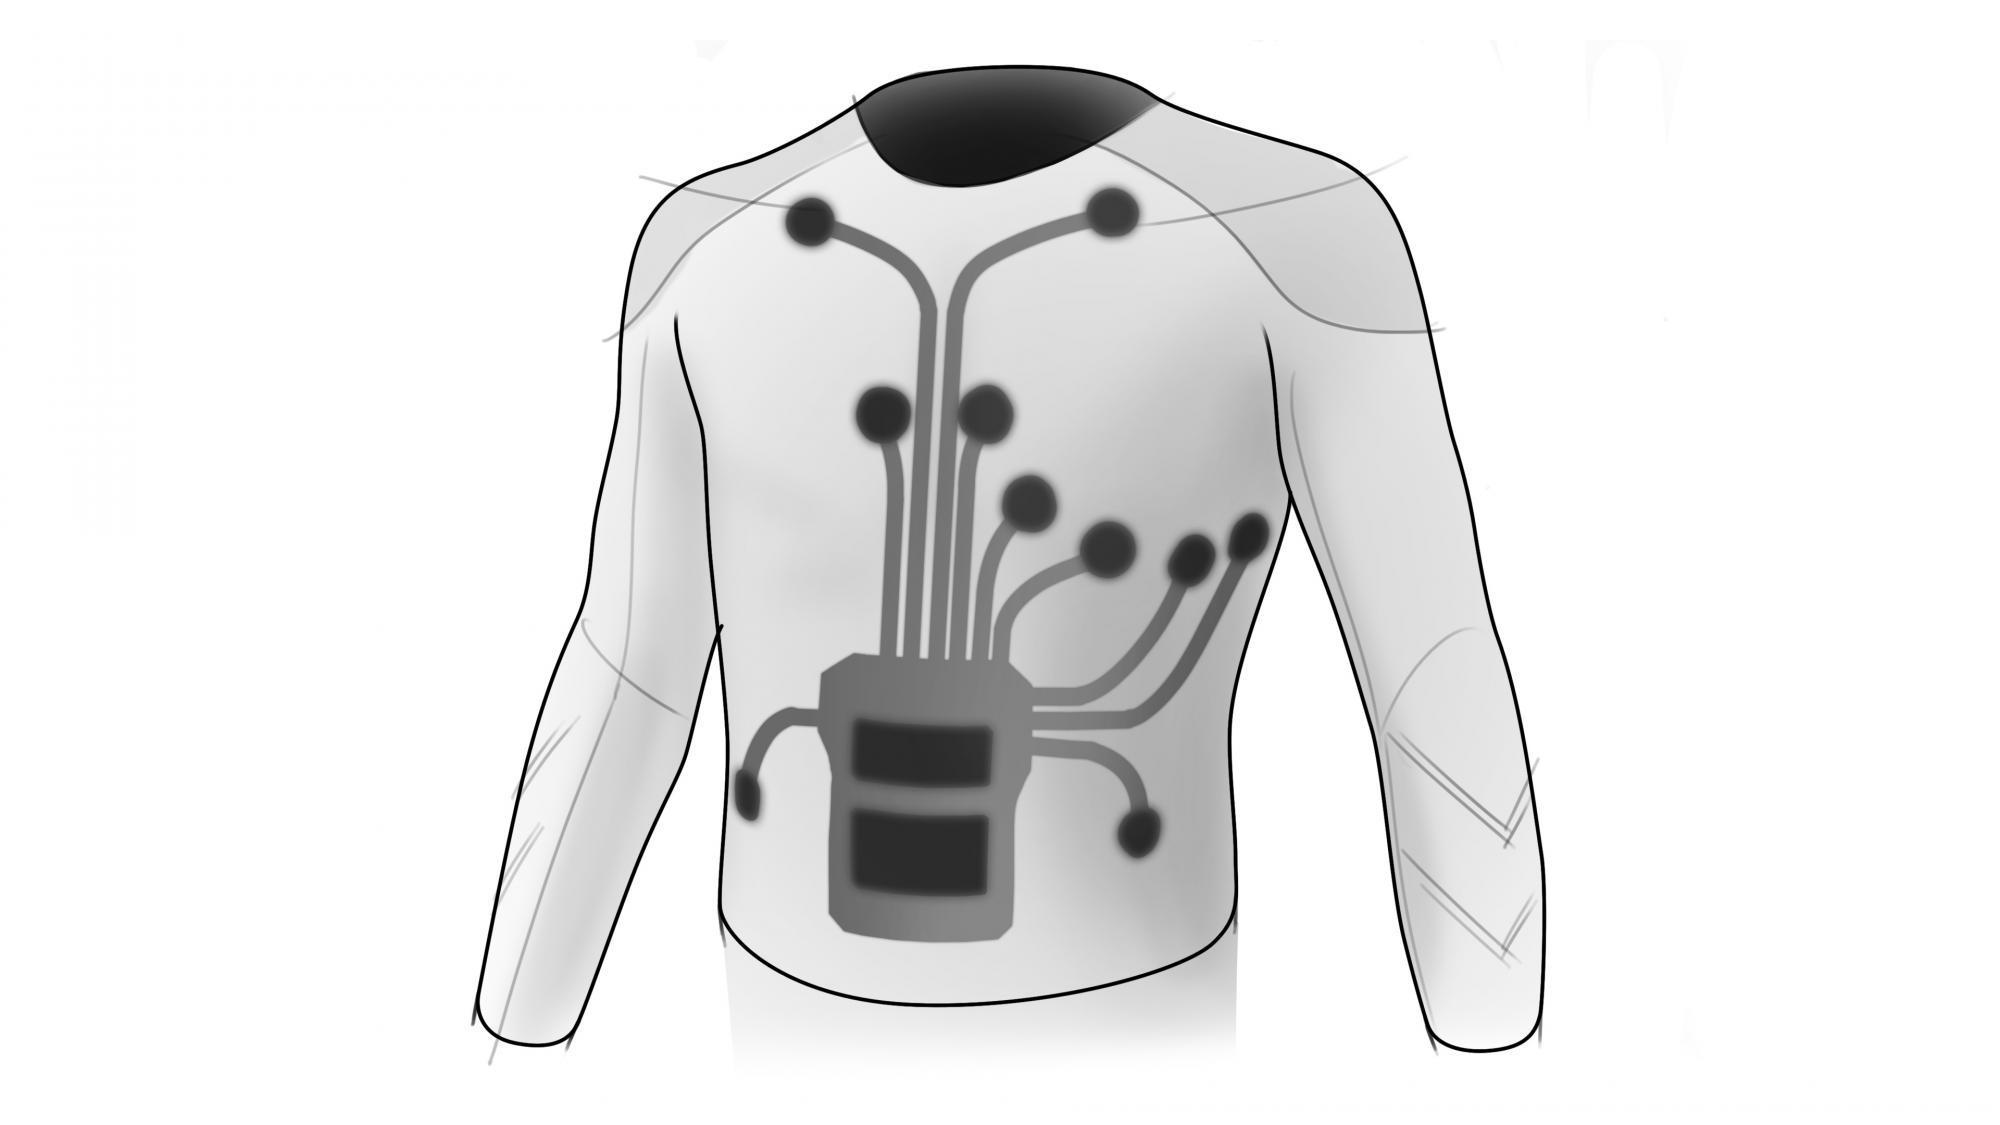 Hot Bar Bonding wearable application